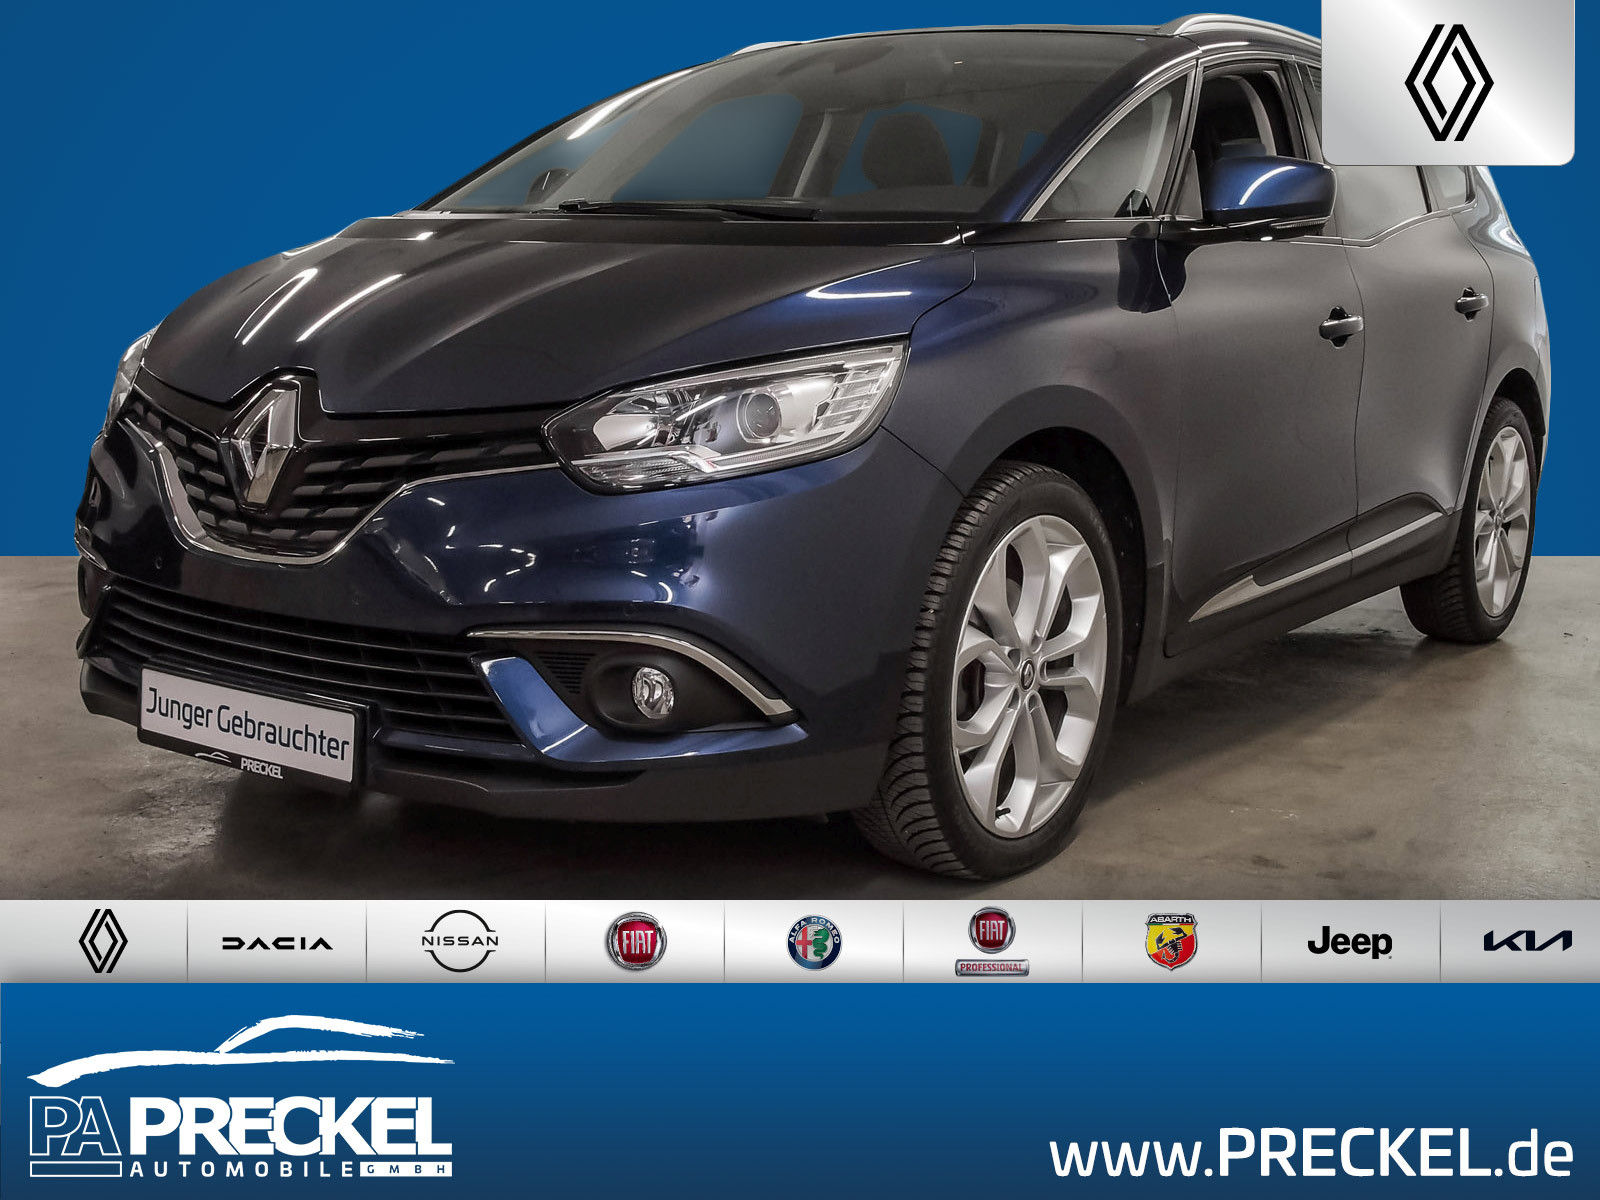 Renault Grand Scenic Intens TCe 130 AHK / Navi / Klima, Jahr 2018, Benzin